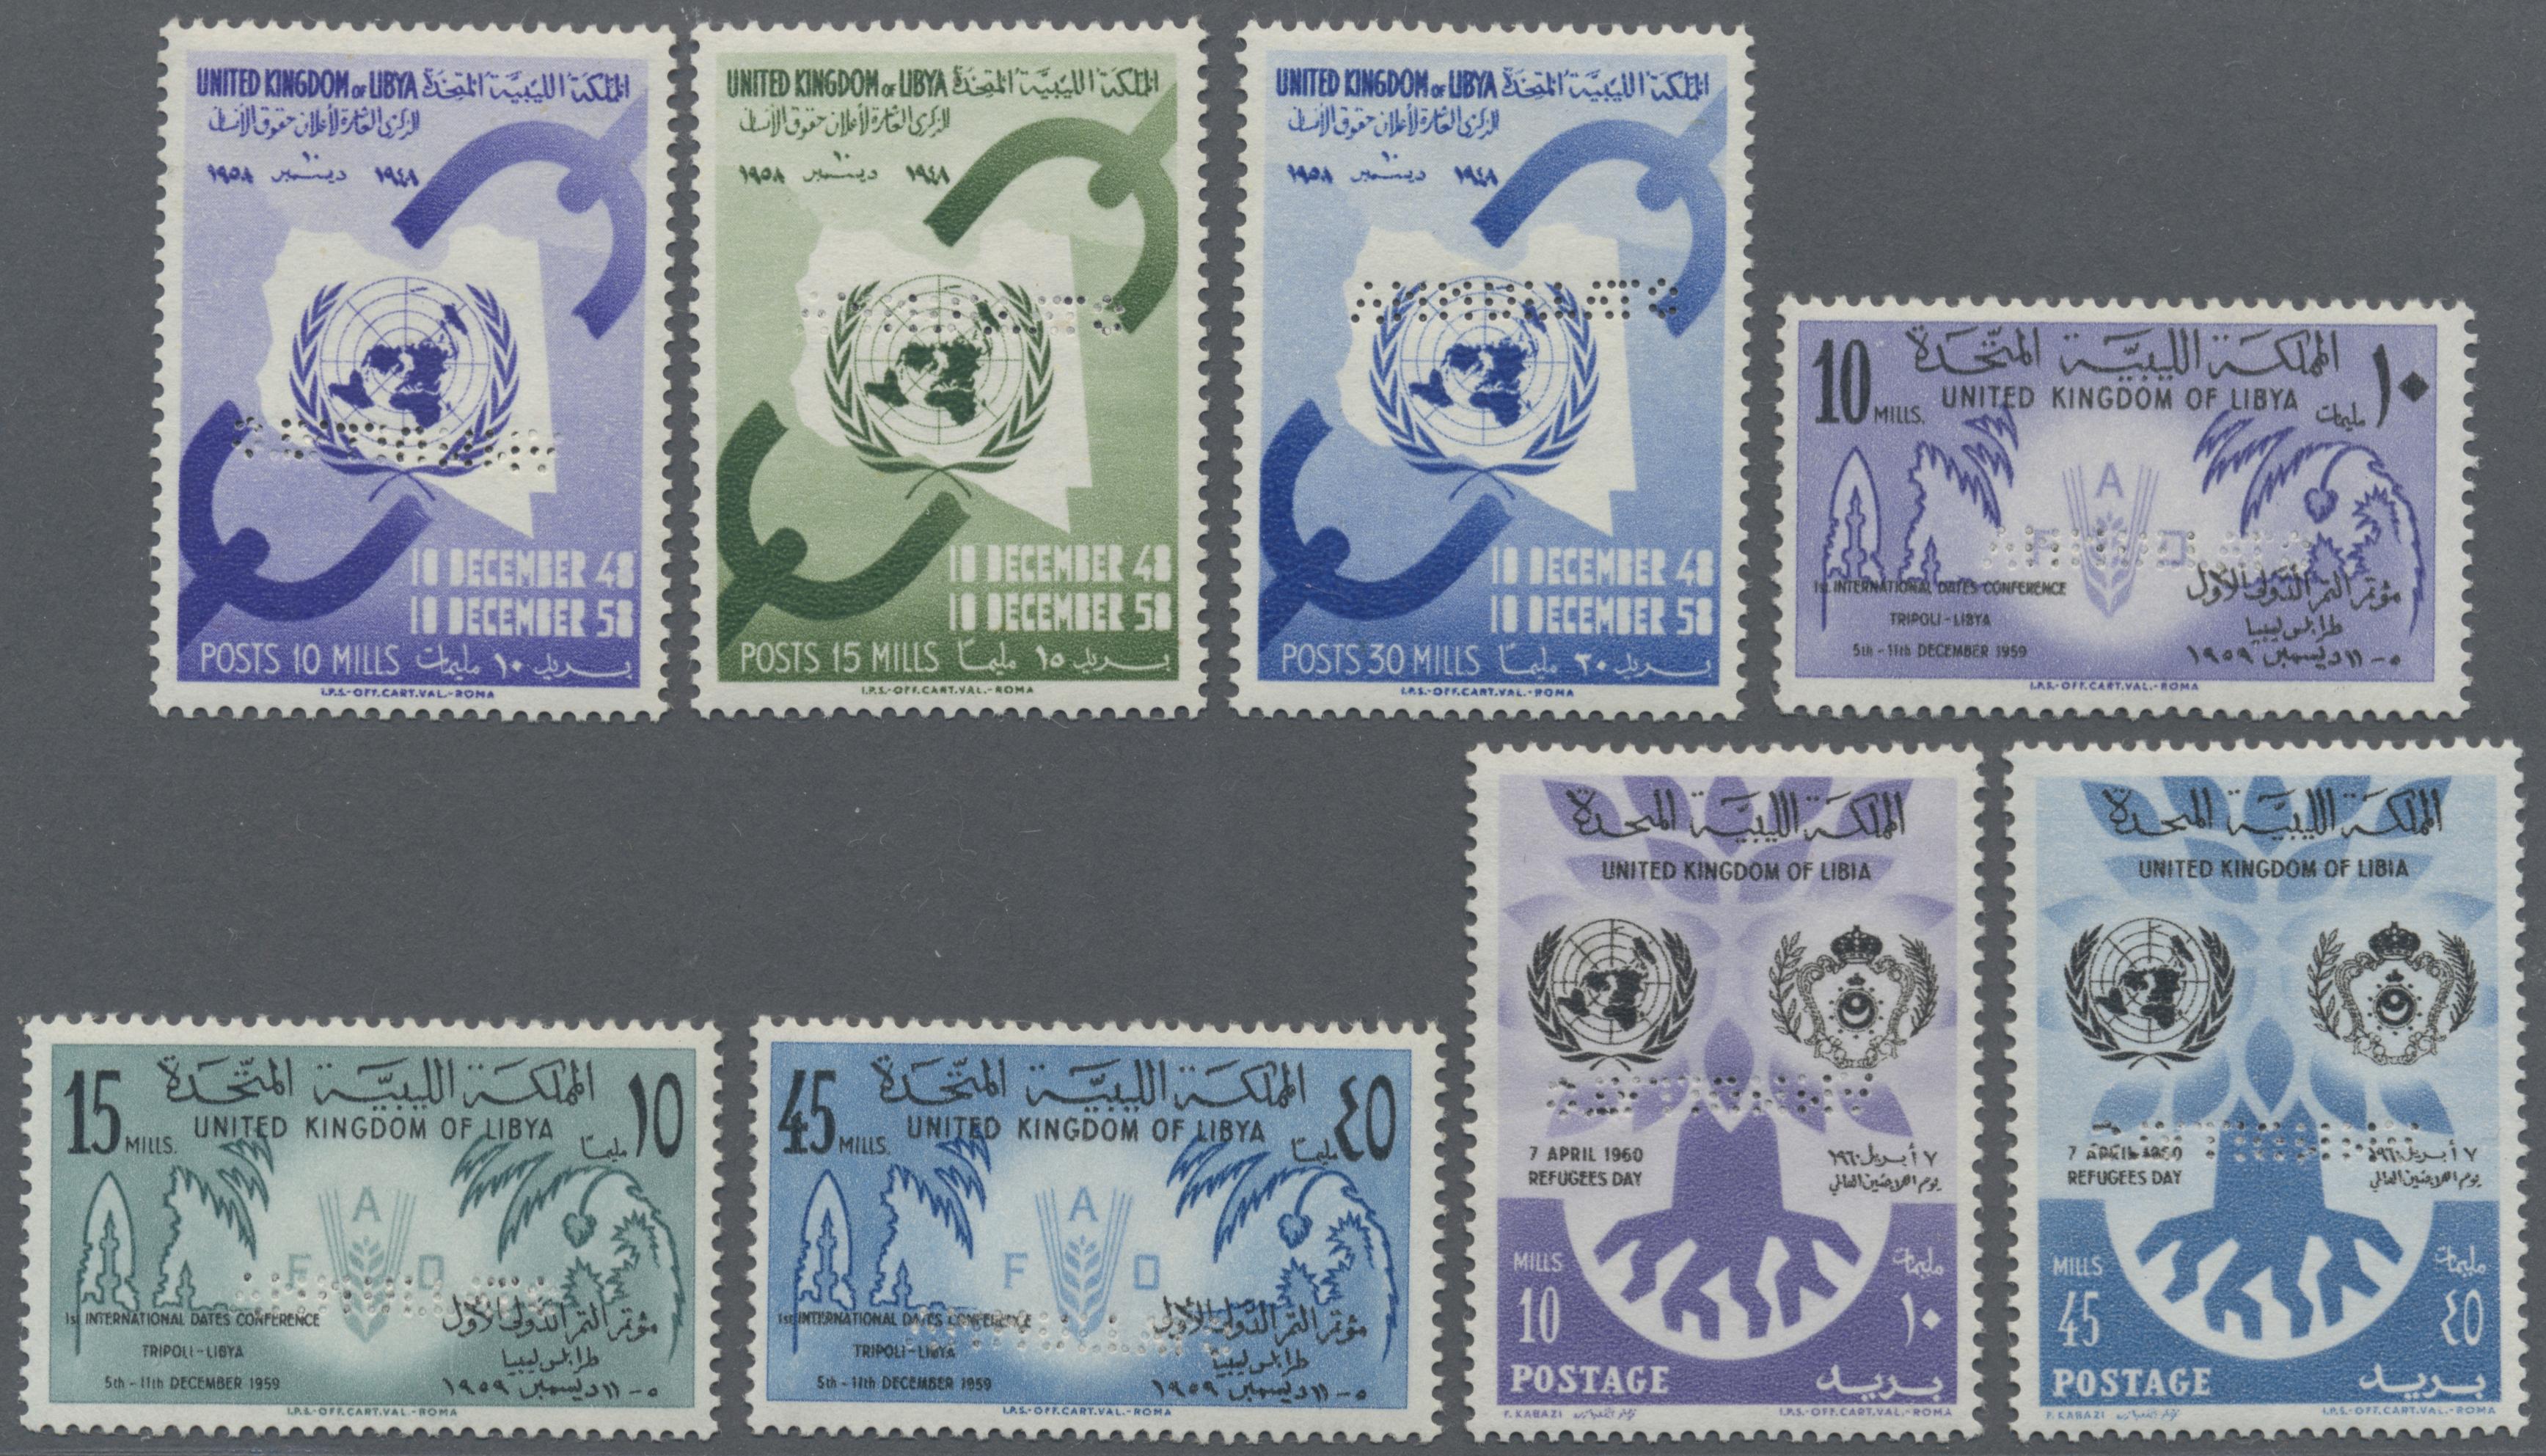 Lot 13975 - libyen  -  Auktionshaus Christoph Gärtner GmbH & Co. KG Single lots Philately Overseas & Europe. Auction #39 Day 4